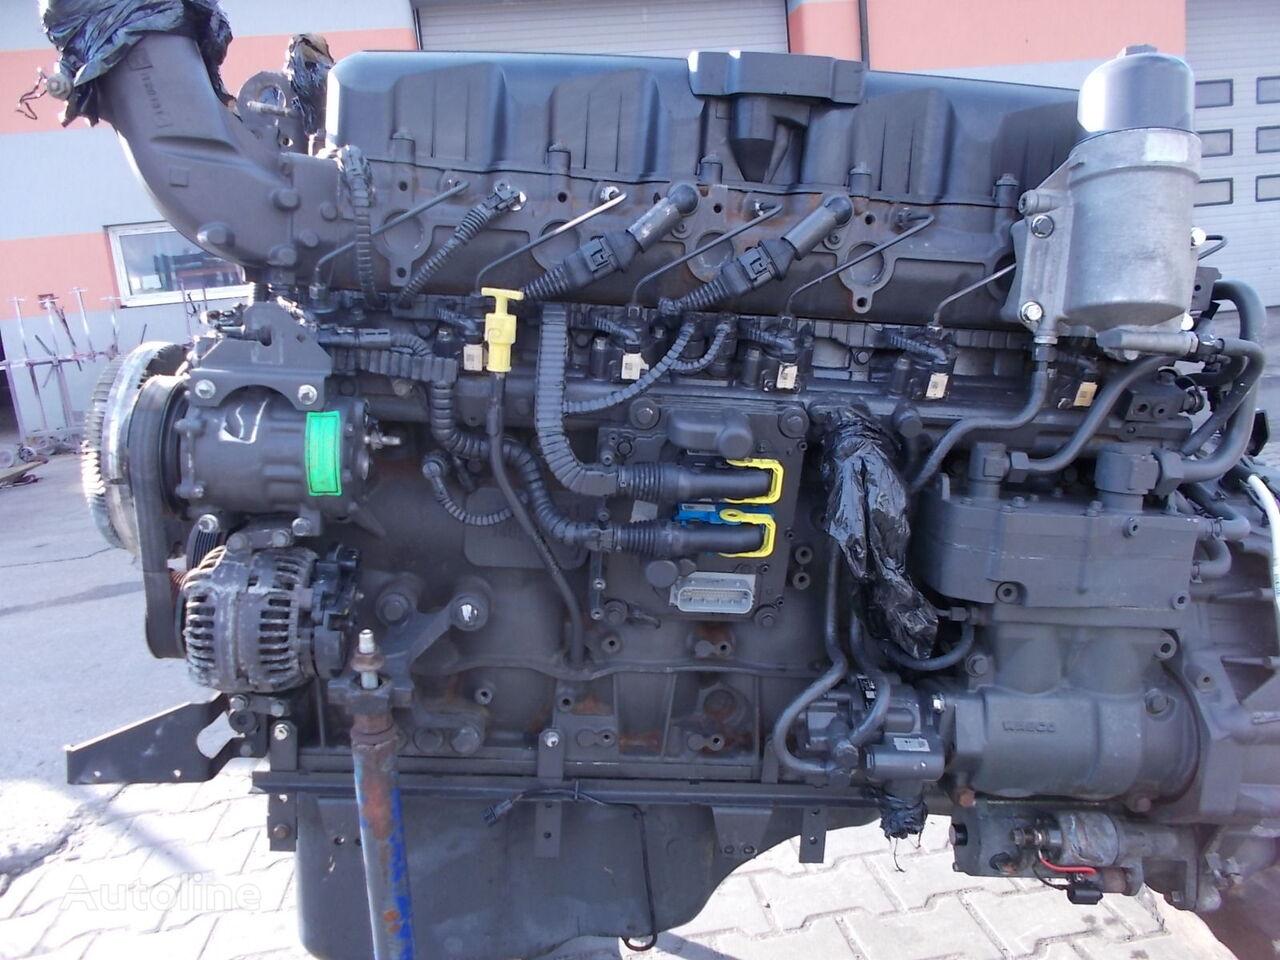 DAF MX340U1 engines for DAF XF 105 truck for sale, motor